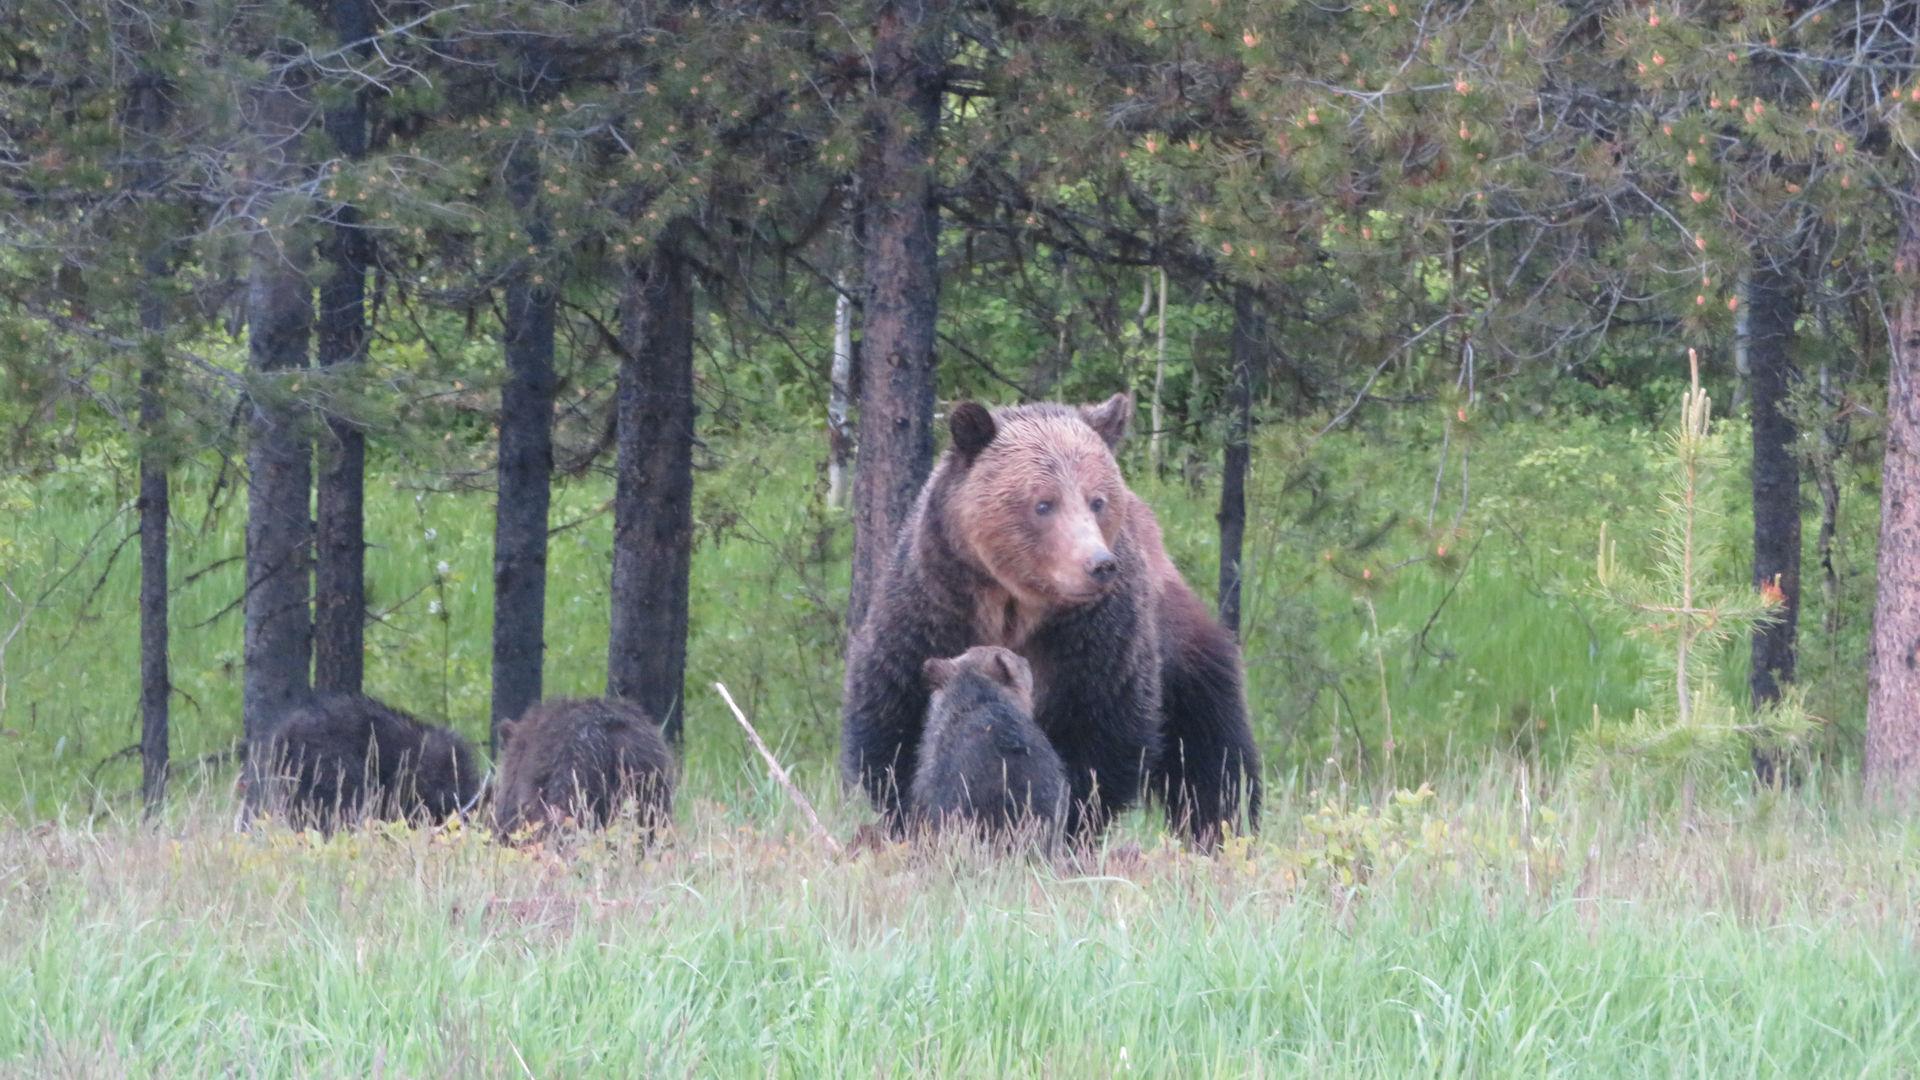 Monica with three cubs, June 8, 2020 - W. K. Walker